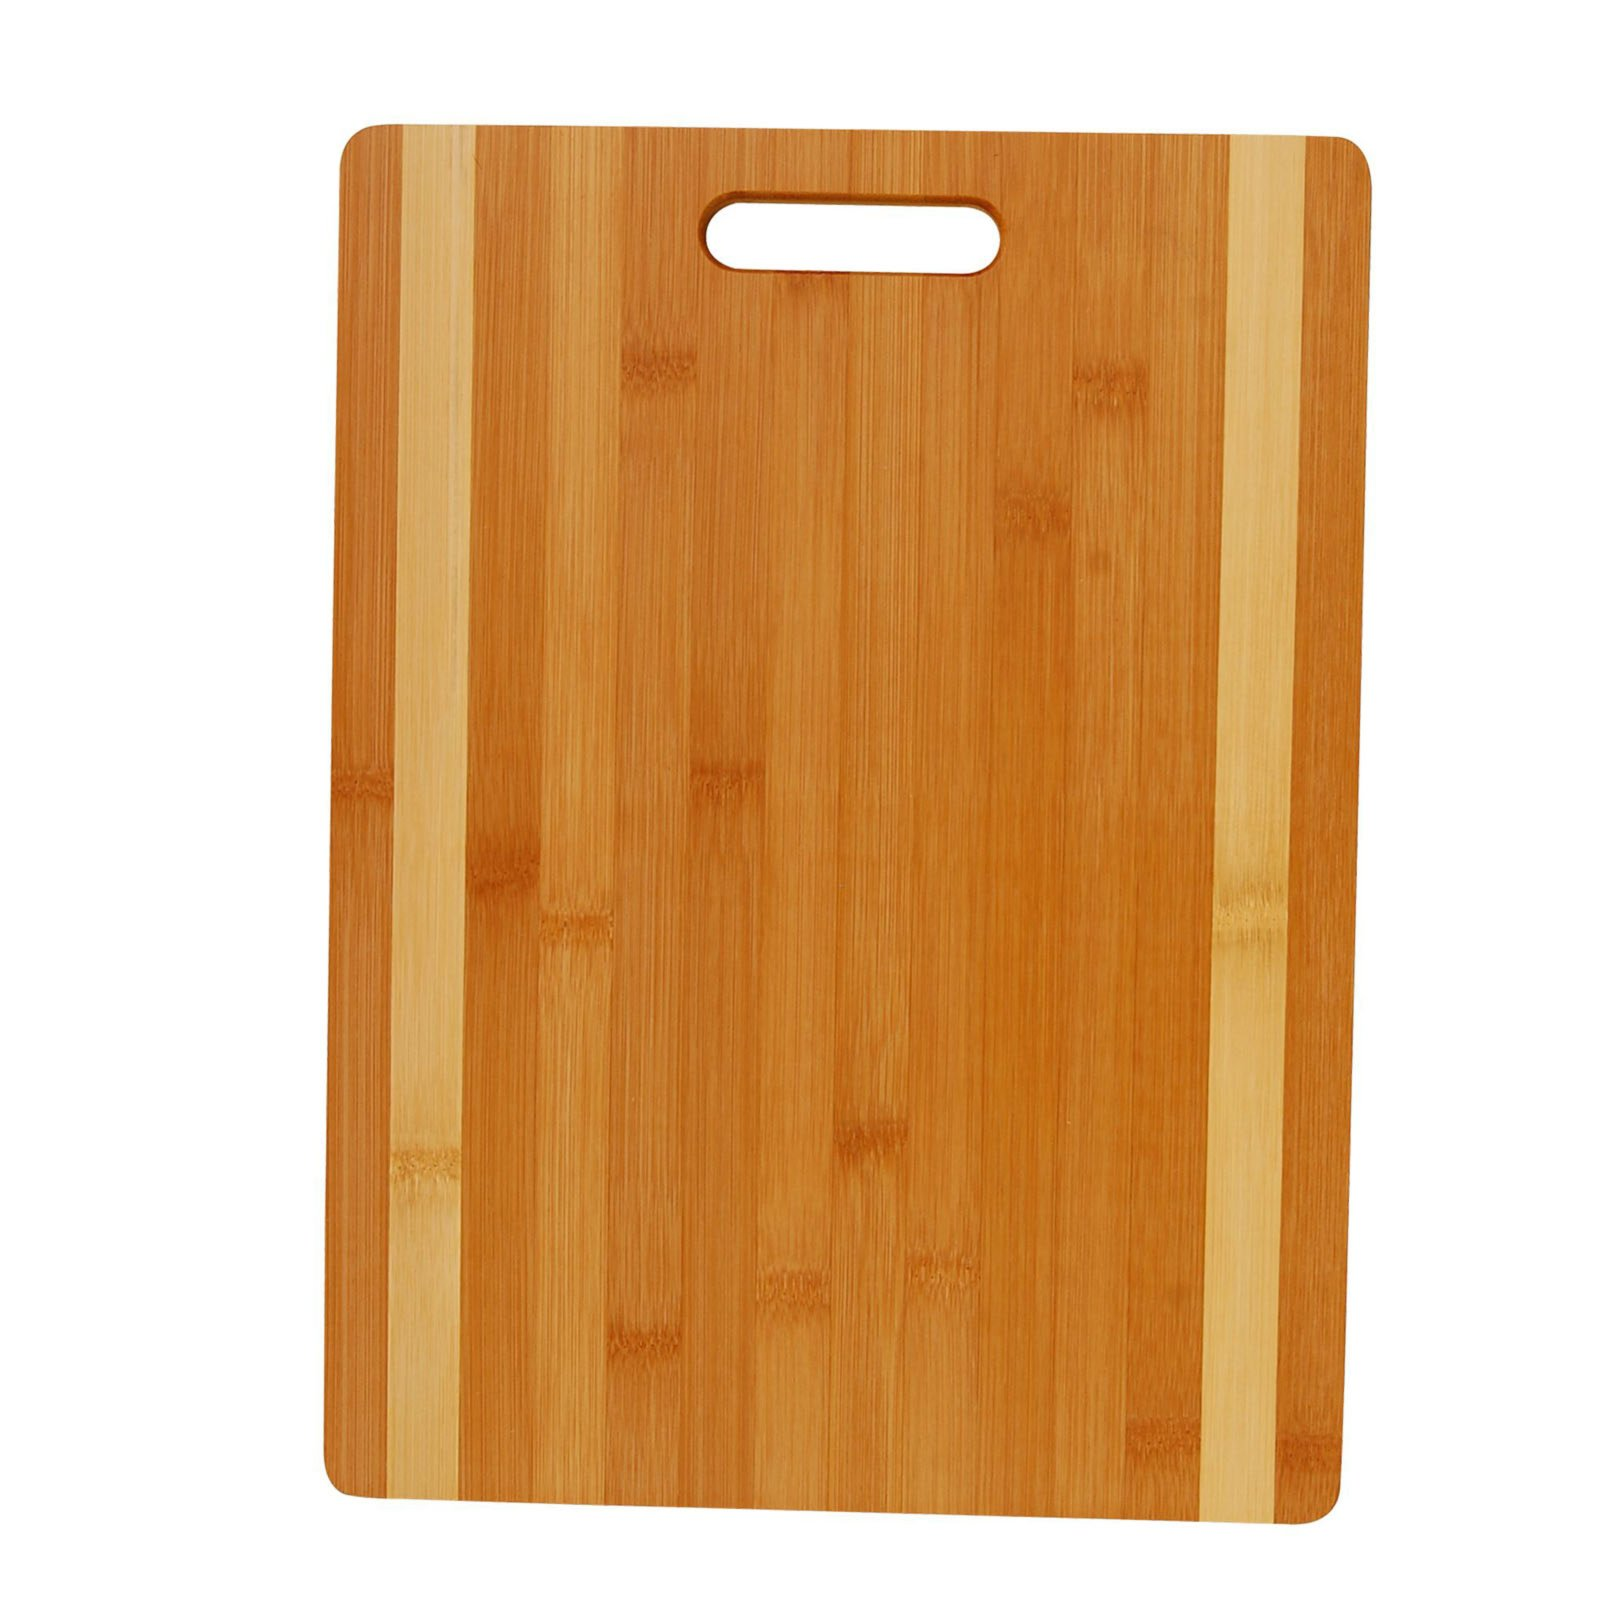 schneidebrett natur bambus 39 cm lang k chenhelfer haushalts k chenzubeh r deko. Black Bedroom Furniture Sets. Home Design Ideas